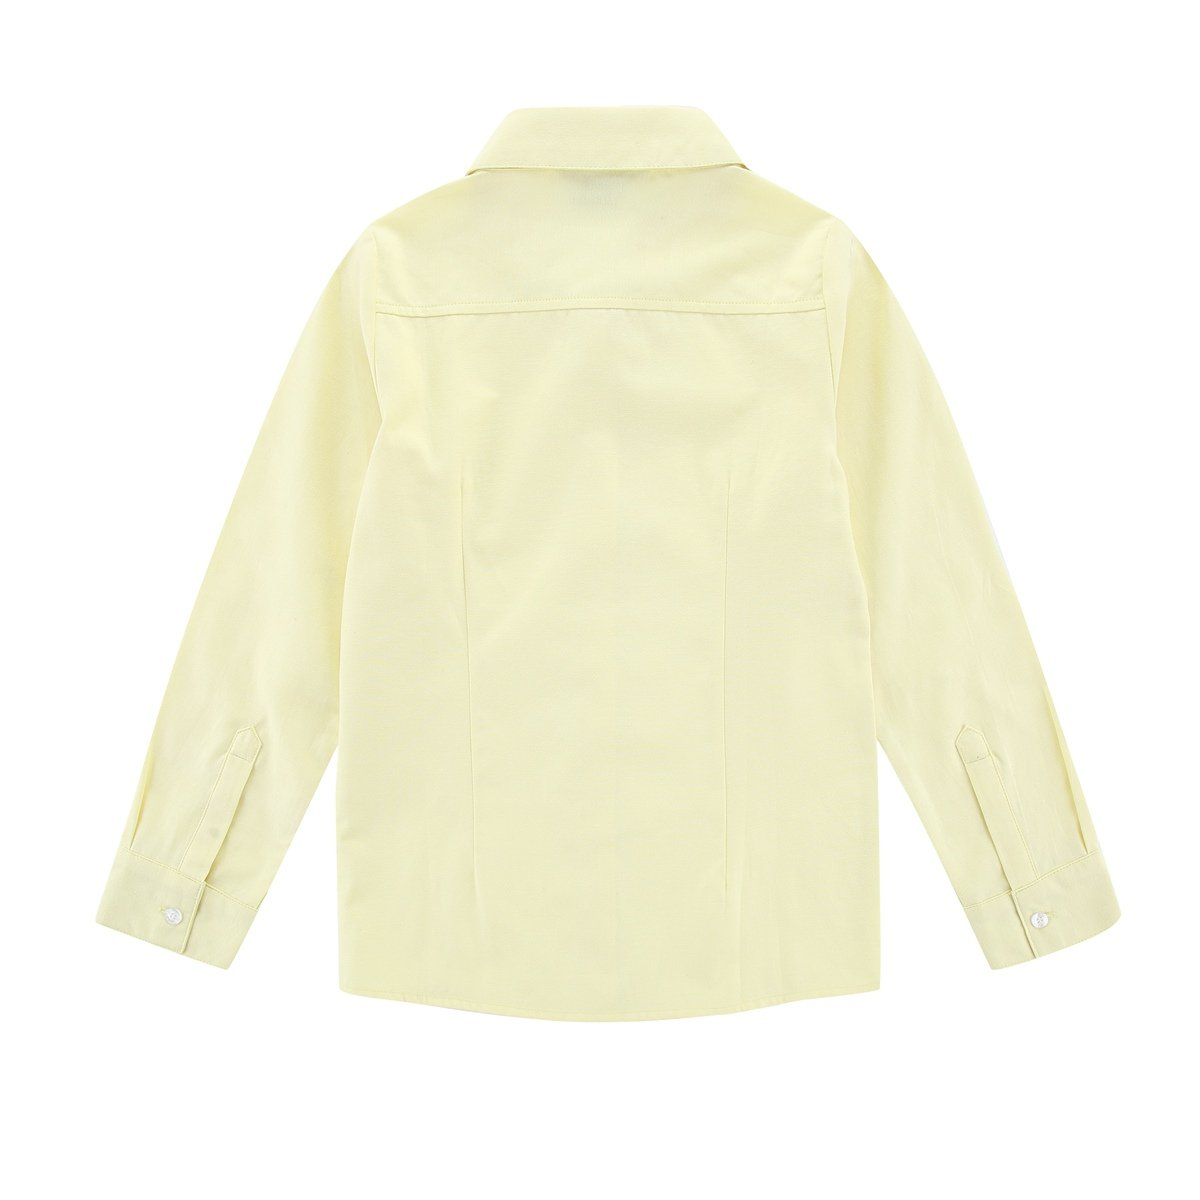 Bienzoe Big Girls School Uniforms Oxford Long Sleeve Blouse